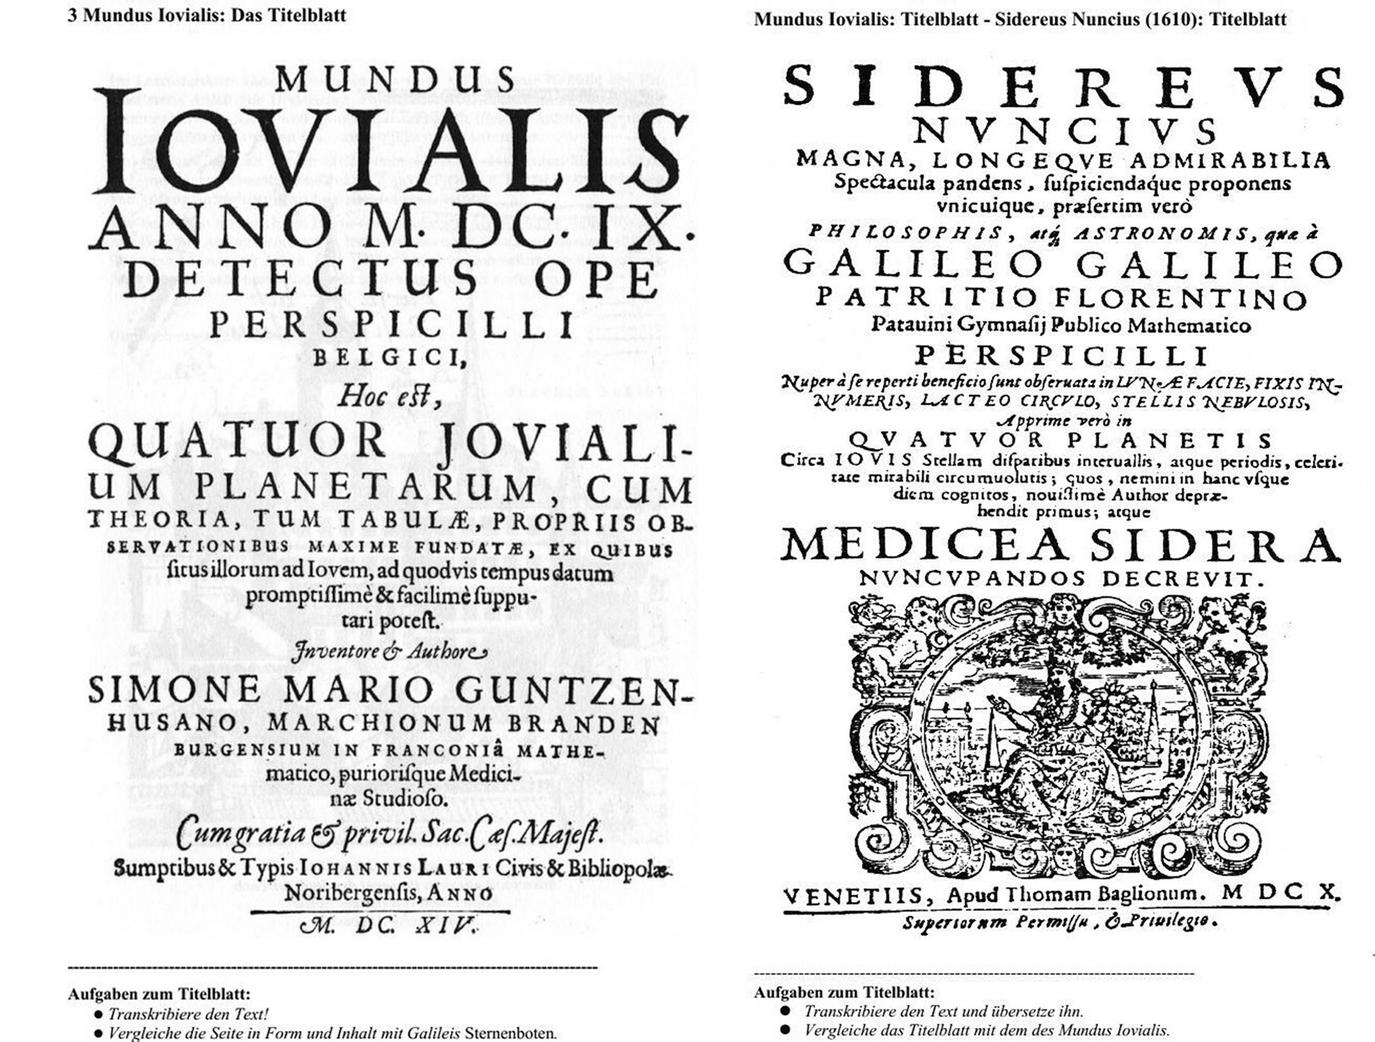 Translating the Mundus Iovialis into German | SpringerLink